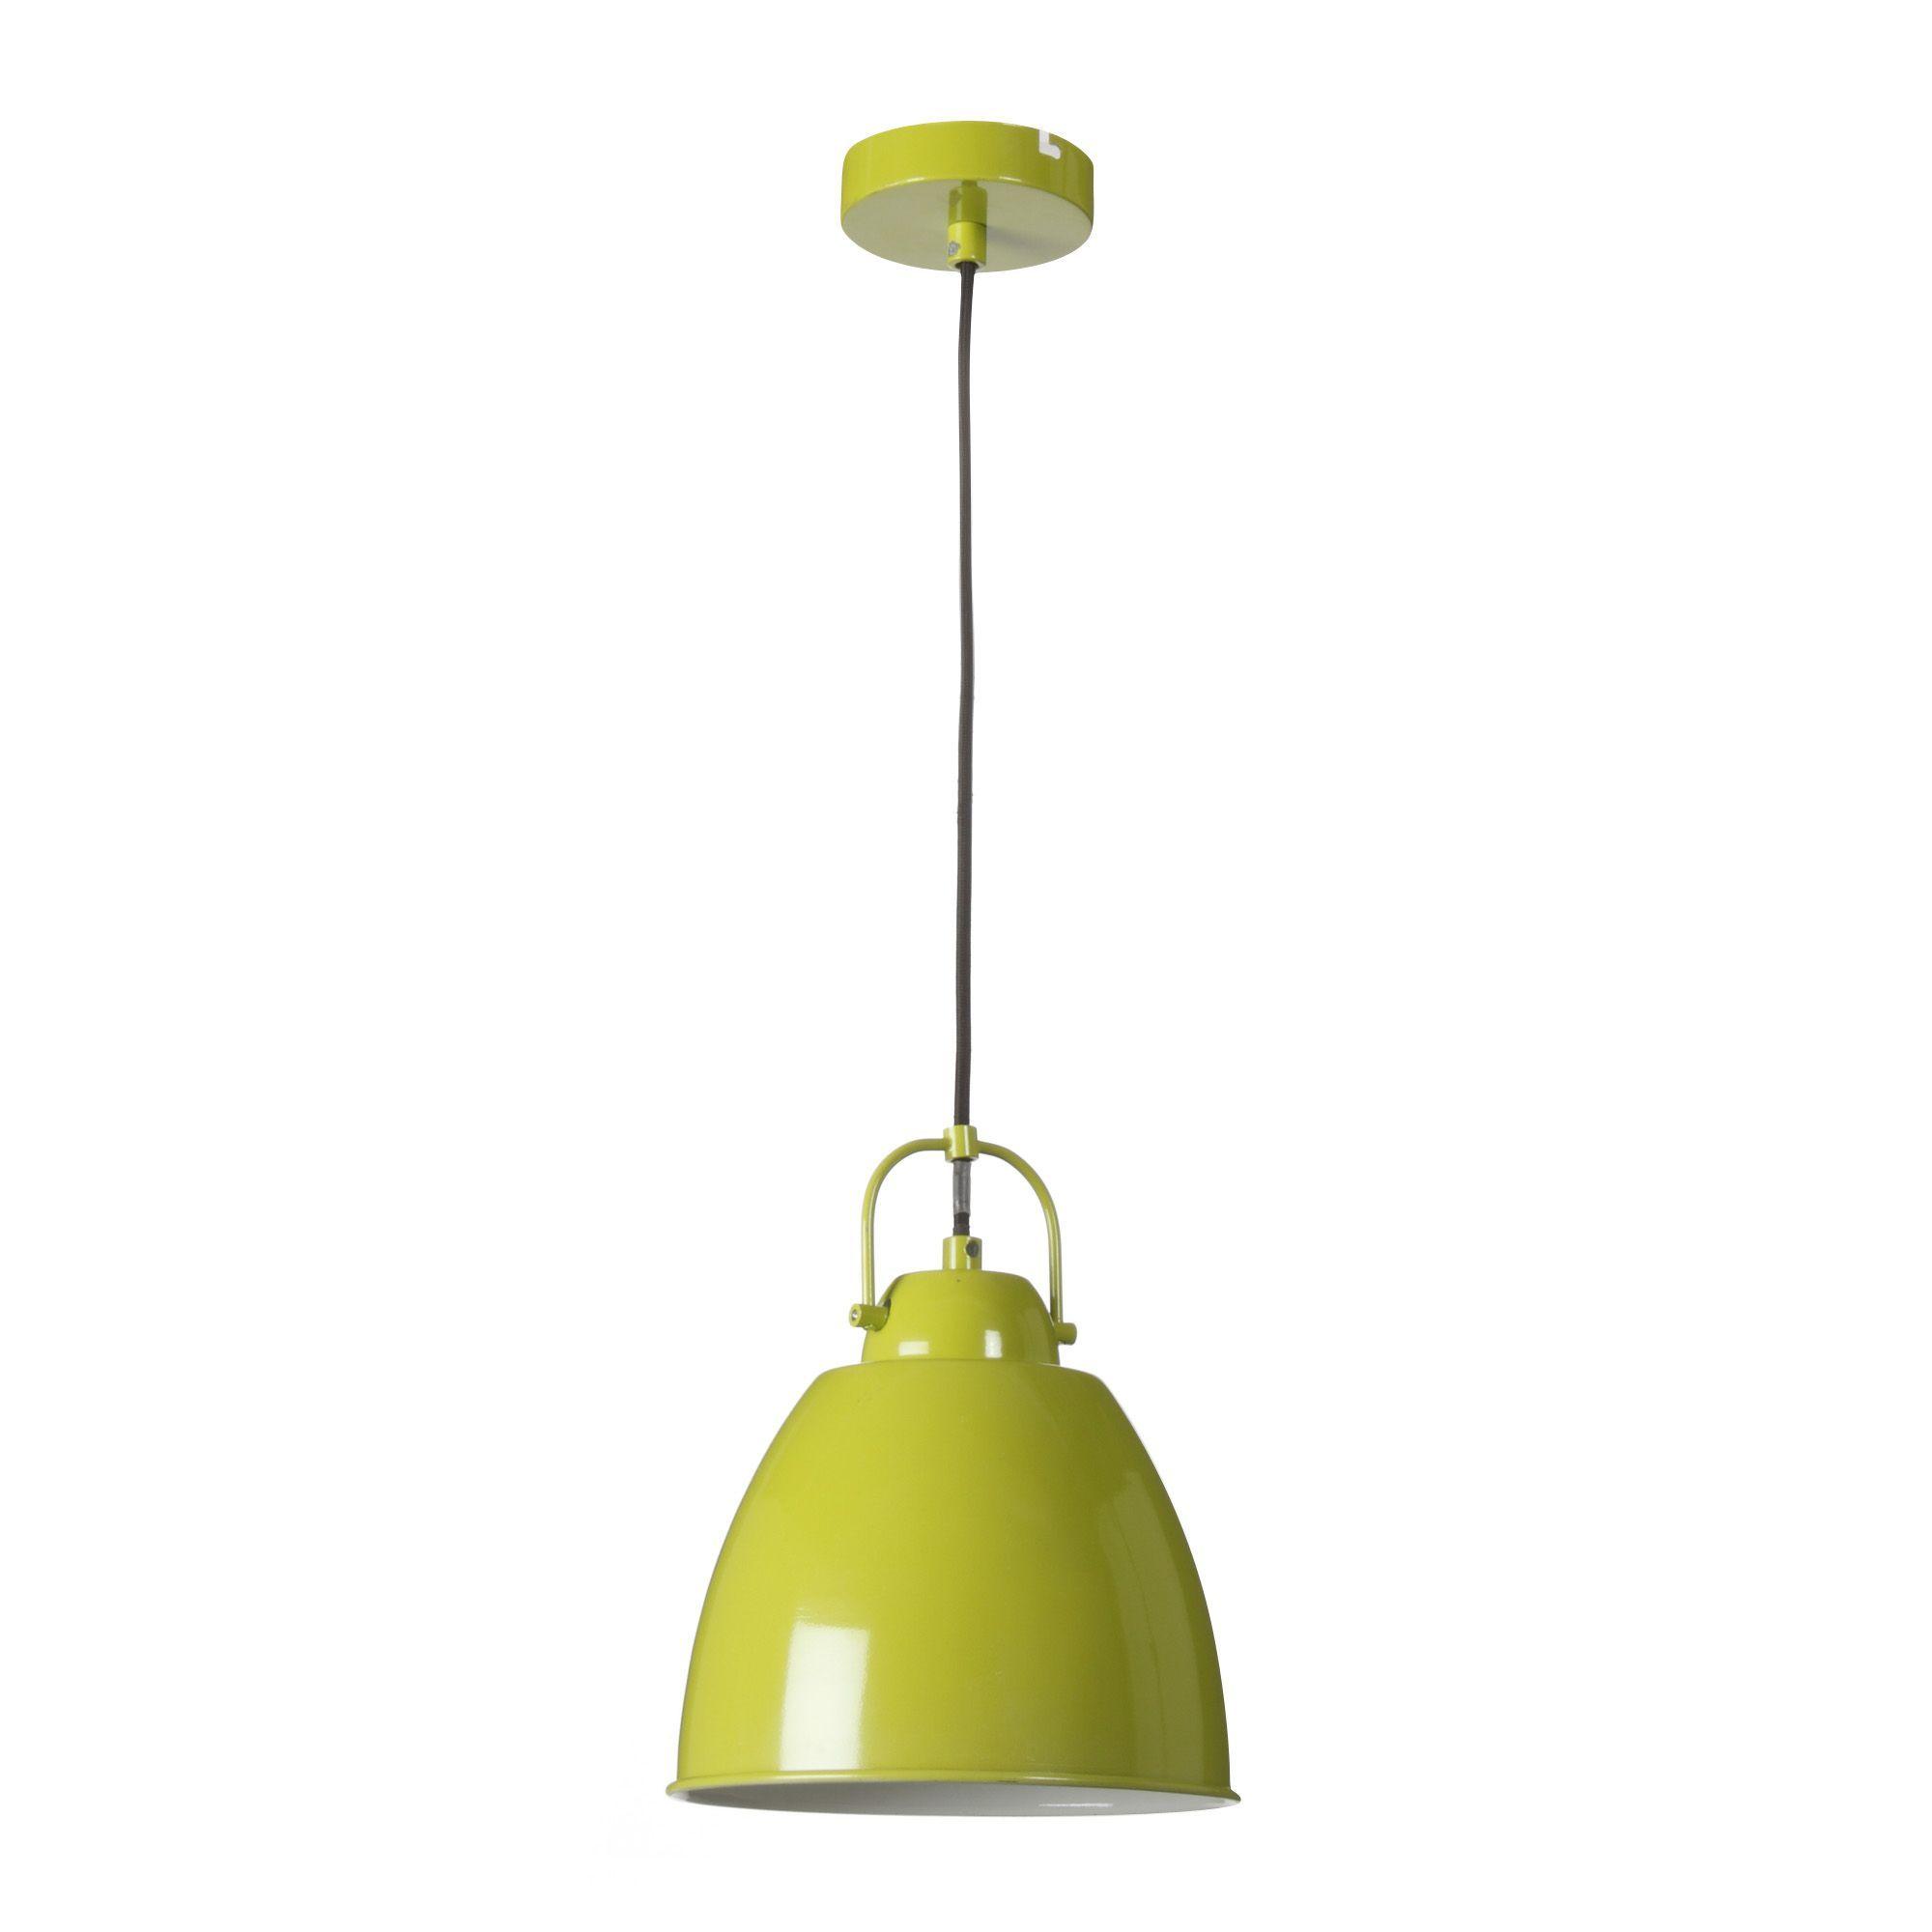 alinea plafonnier great dco luminaire ilot de cuisine. Black Bedroom Furniture Sets. Home Design Ideas